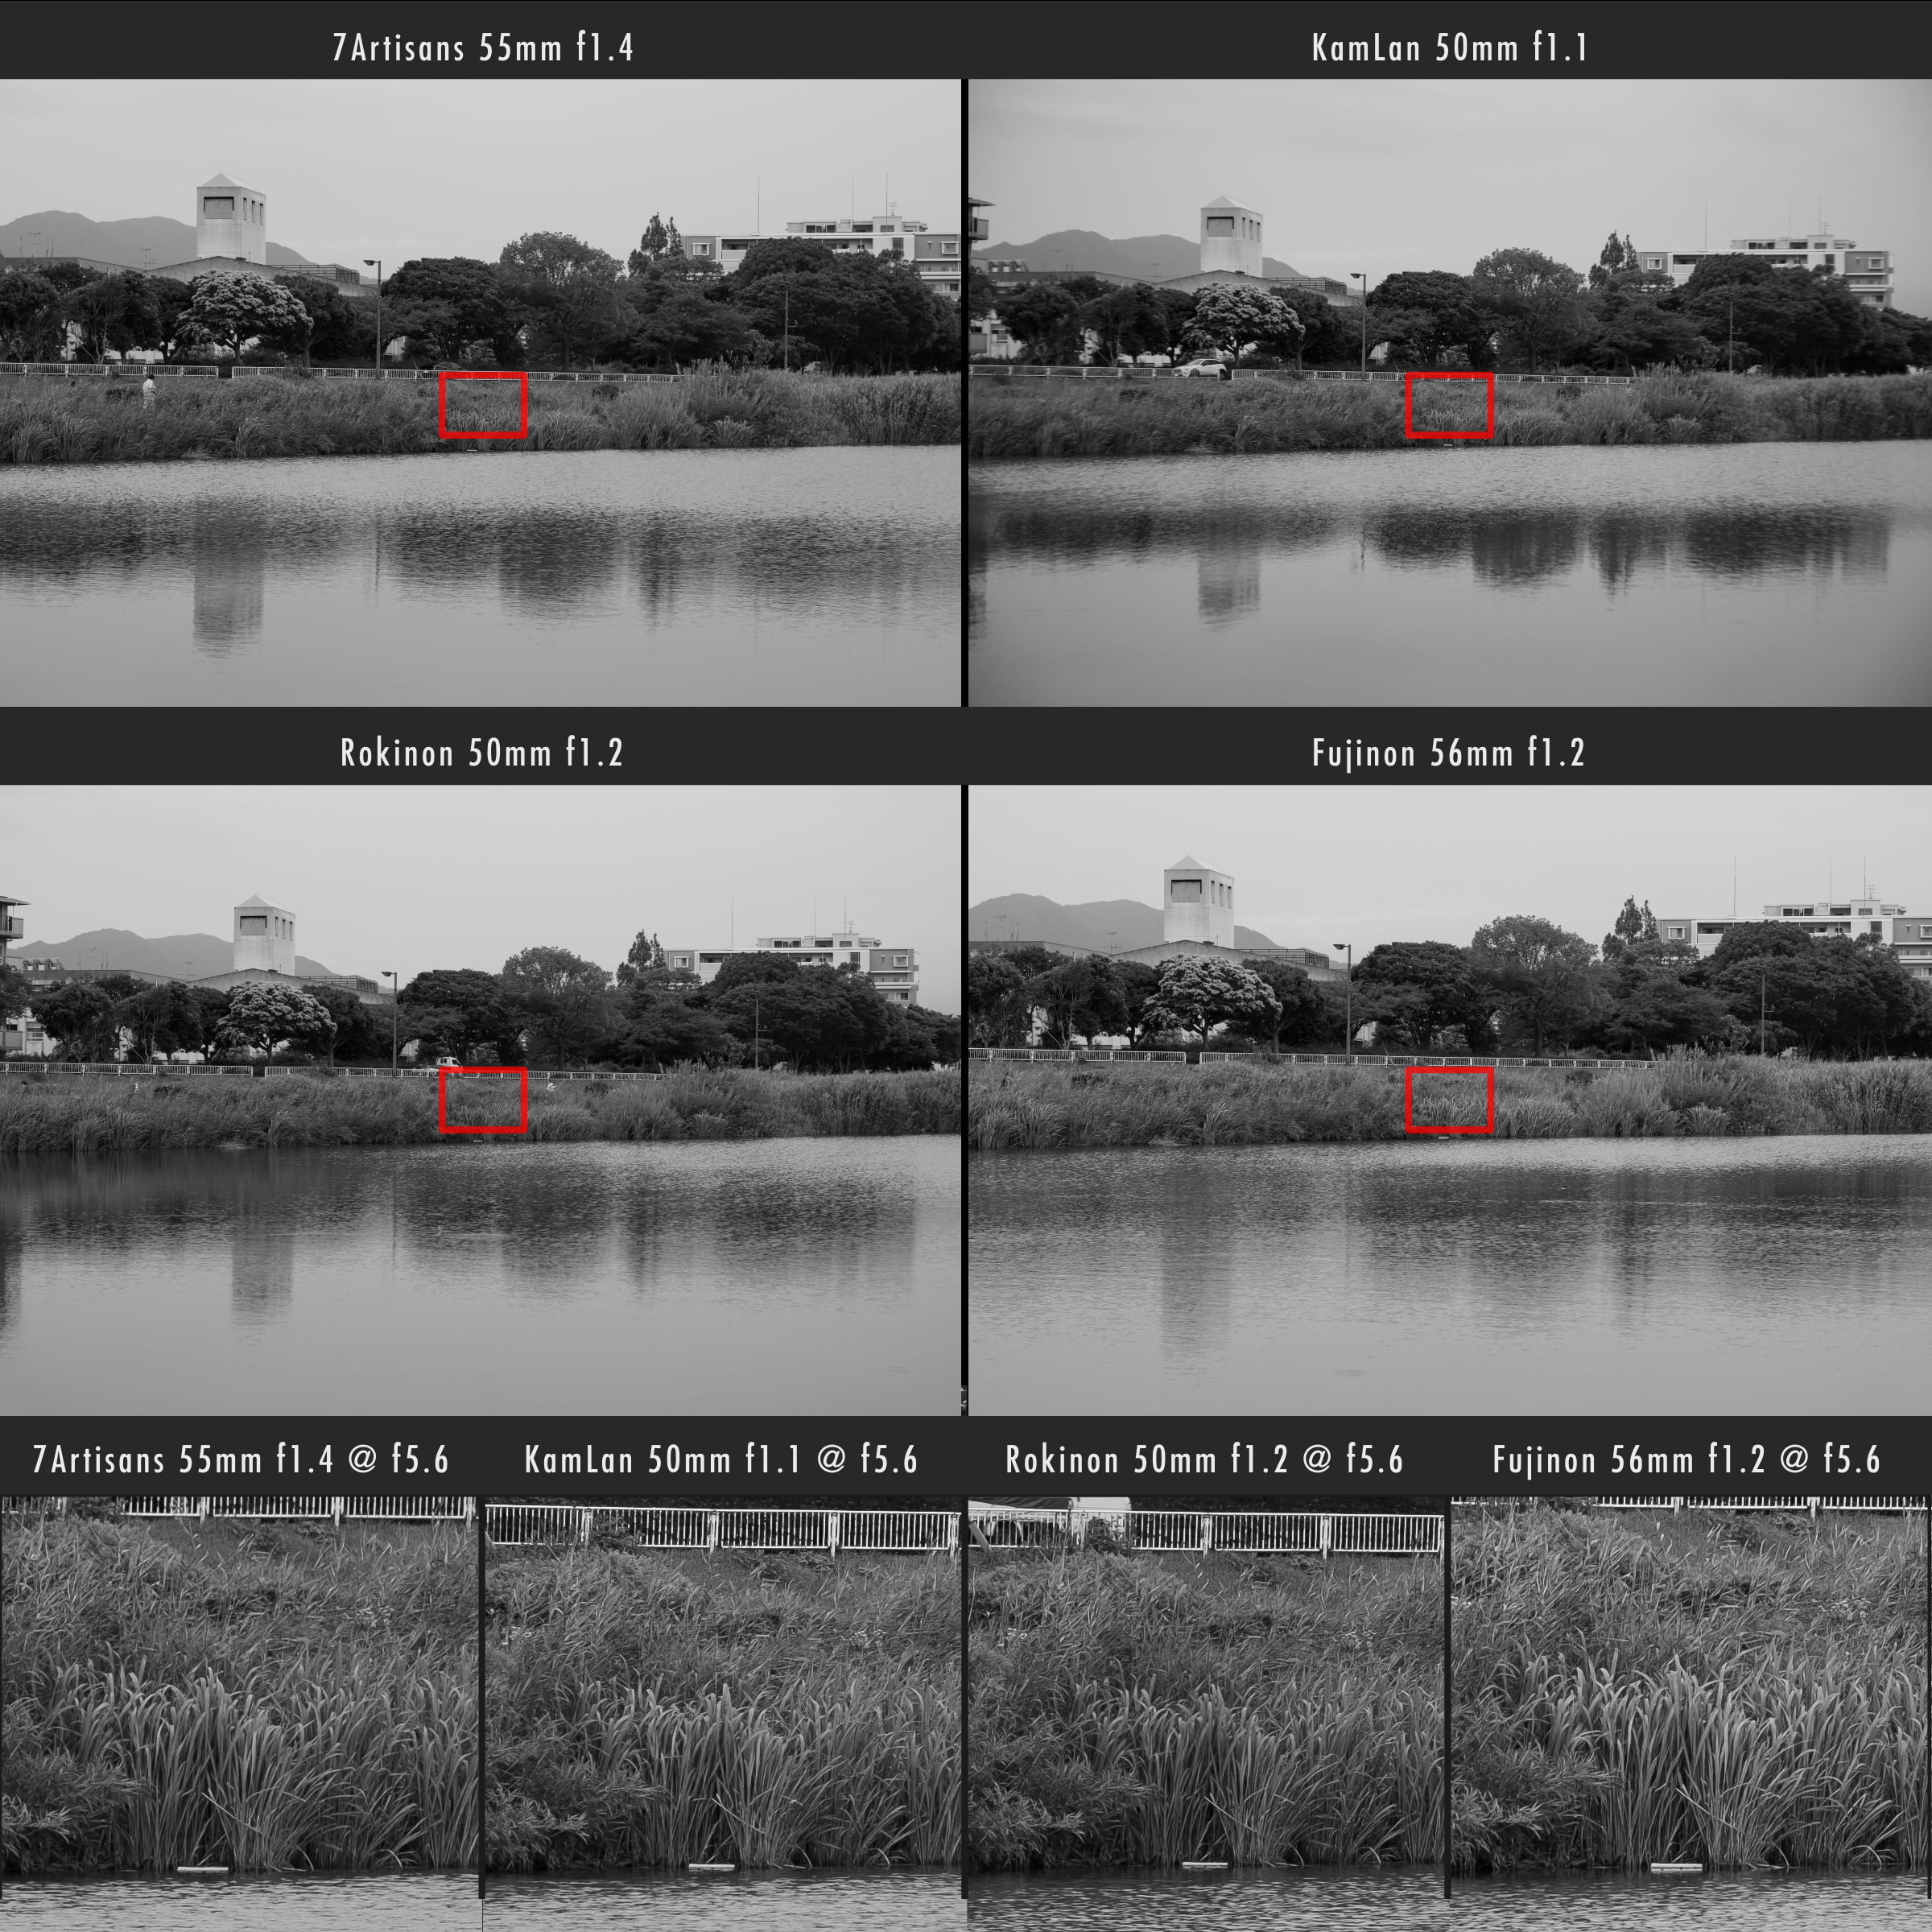 Kamlan 50mm f1.1 vs 7Artisans 55mm f1.4 vs Rokinon 50mm f1.2 Center Sharpness Comparison f5.6